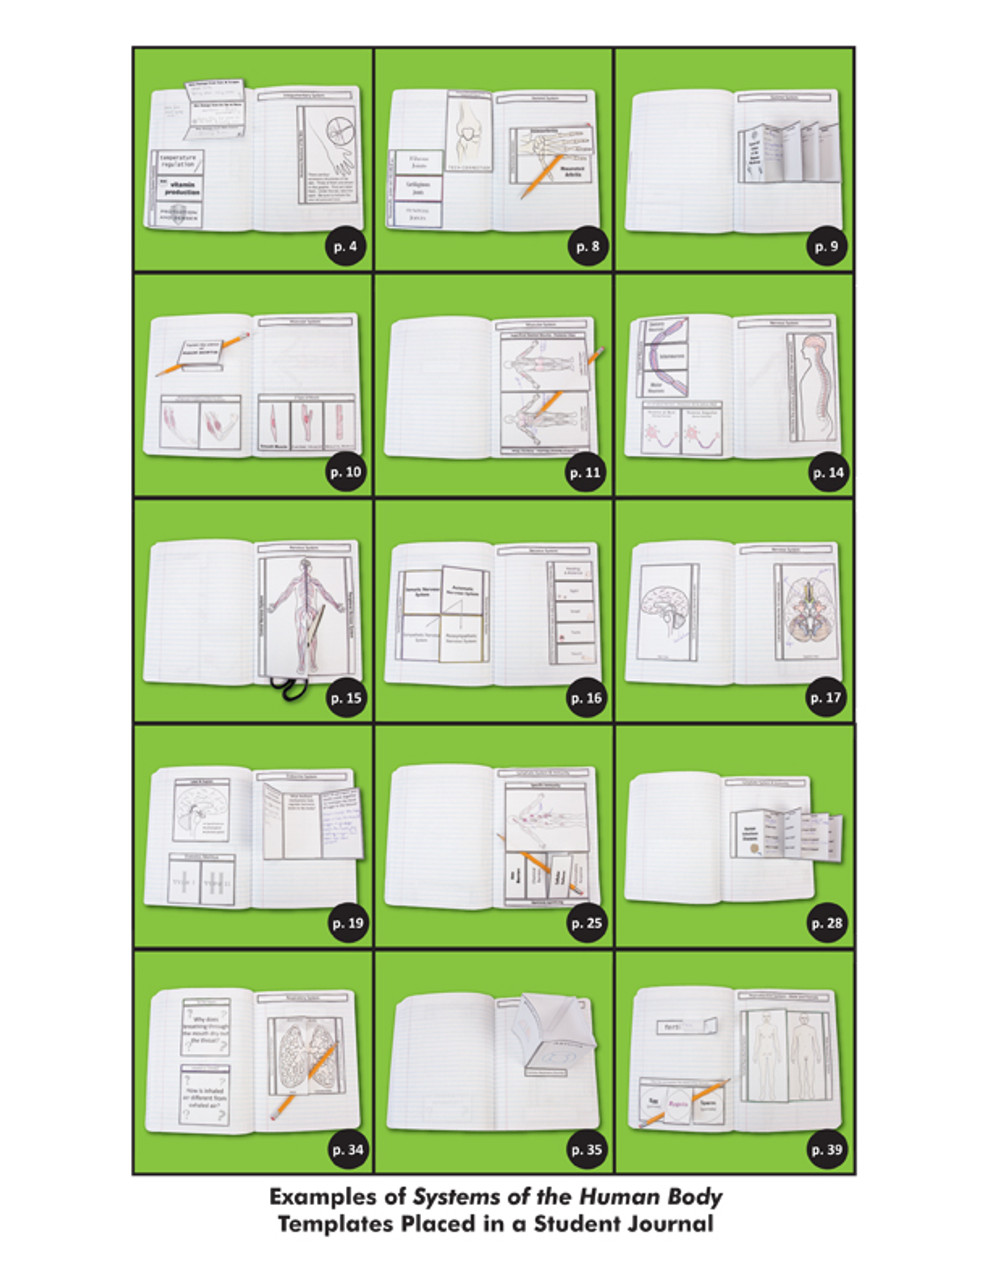 Nc humanbodysystems nov11 layout 1 (page 03)